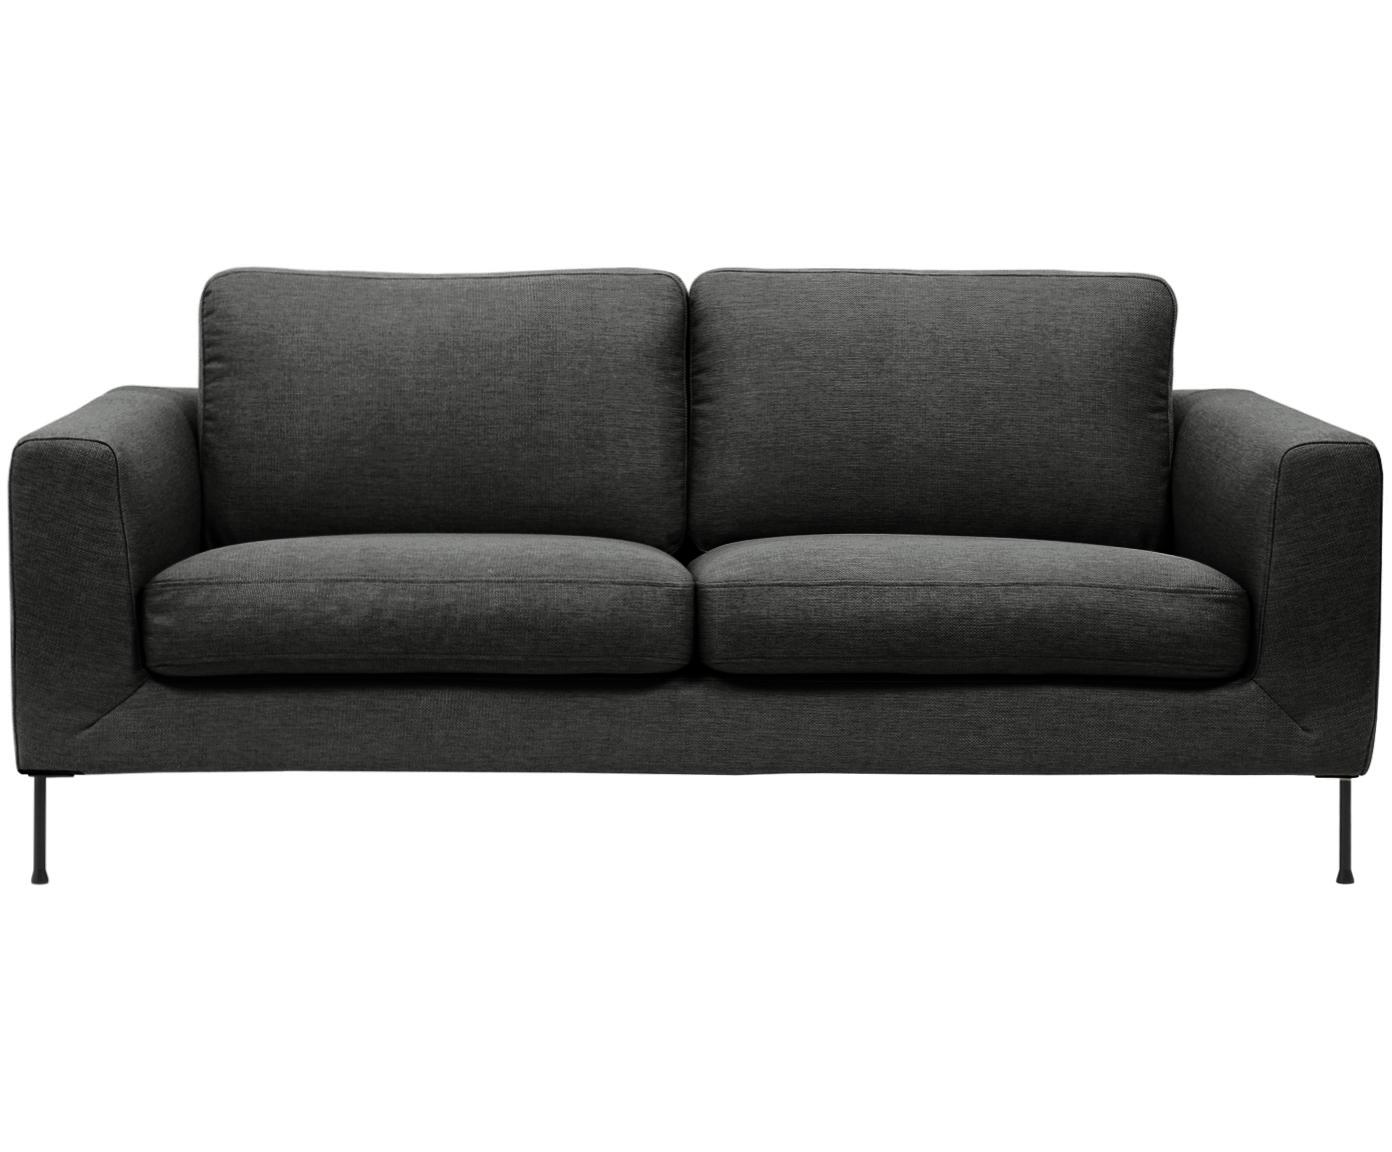 Sofa Cucita (2-Sitzer), Bezug: Webstoff (Polyester) 45.0, Gestell: Massives Kiefernholz, Webstoff Anthrazit, B 187 x T 94 cm